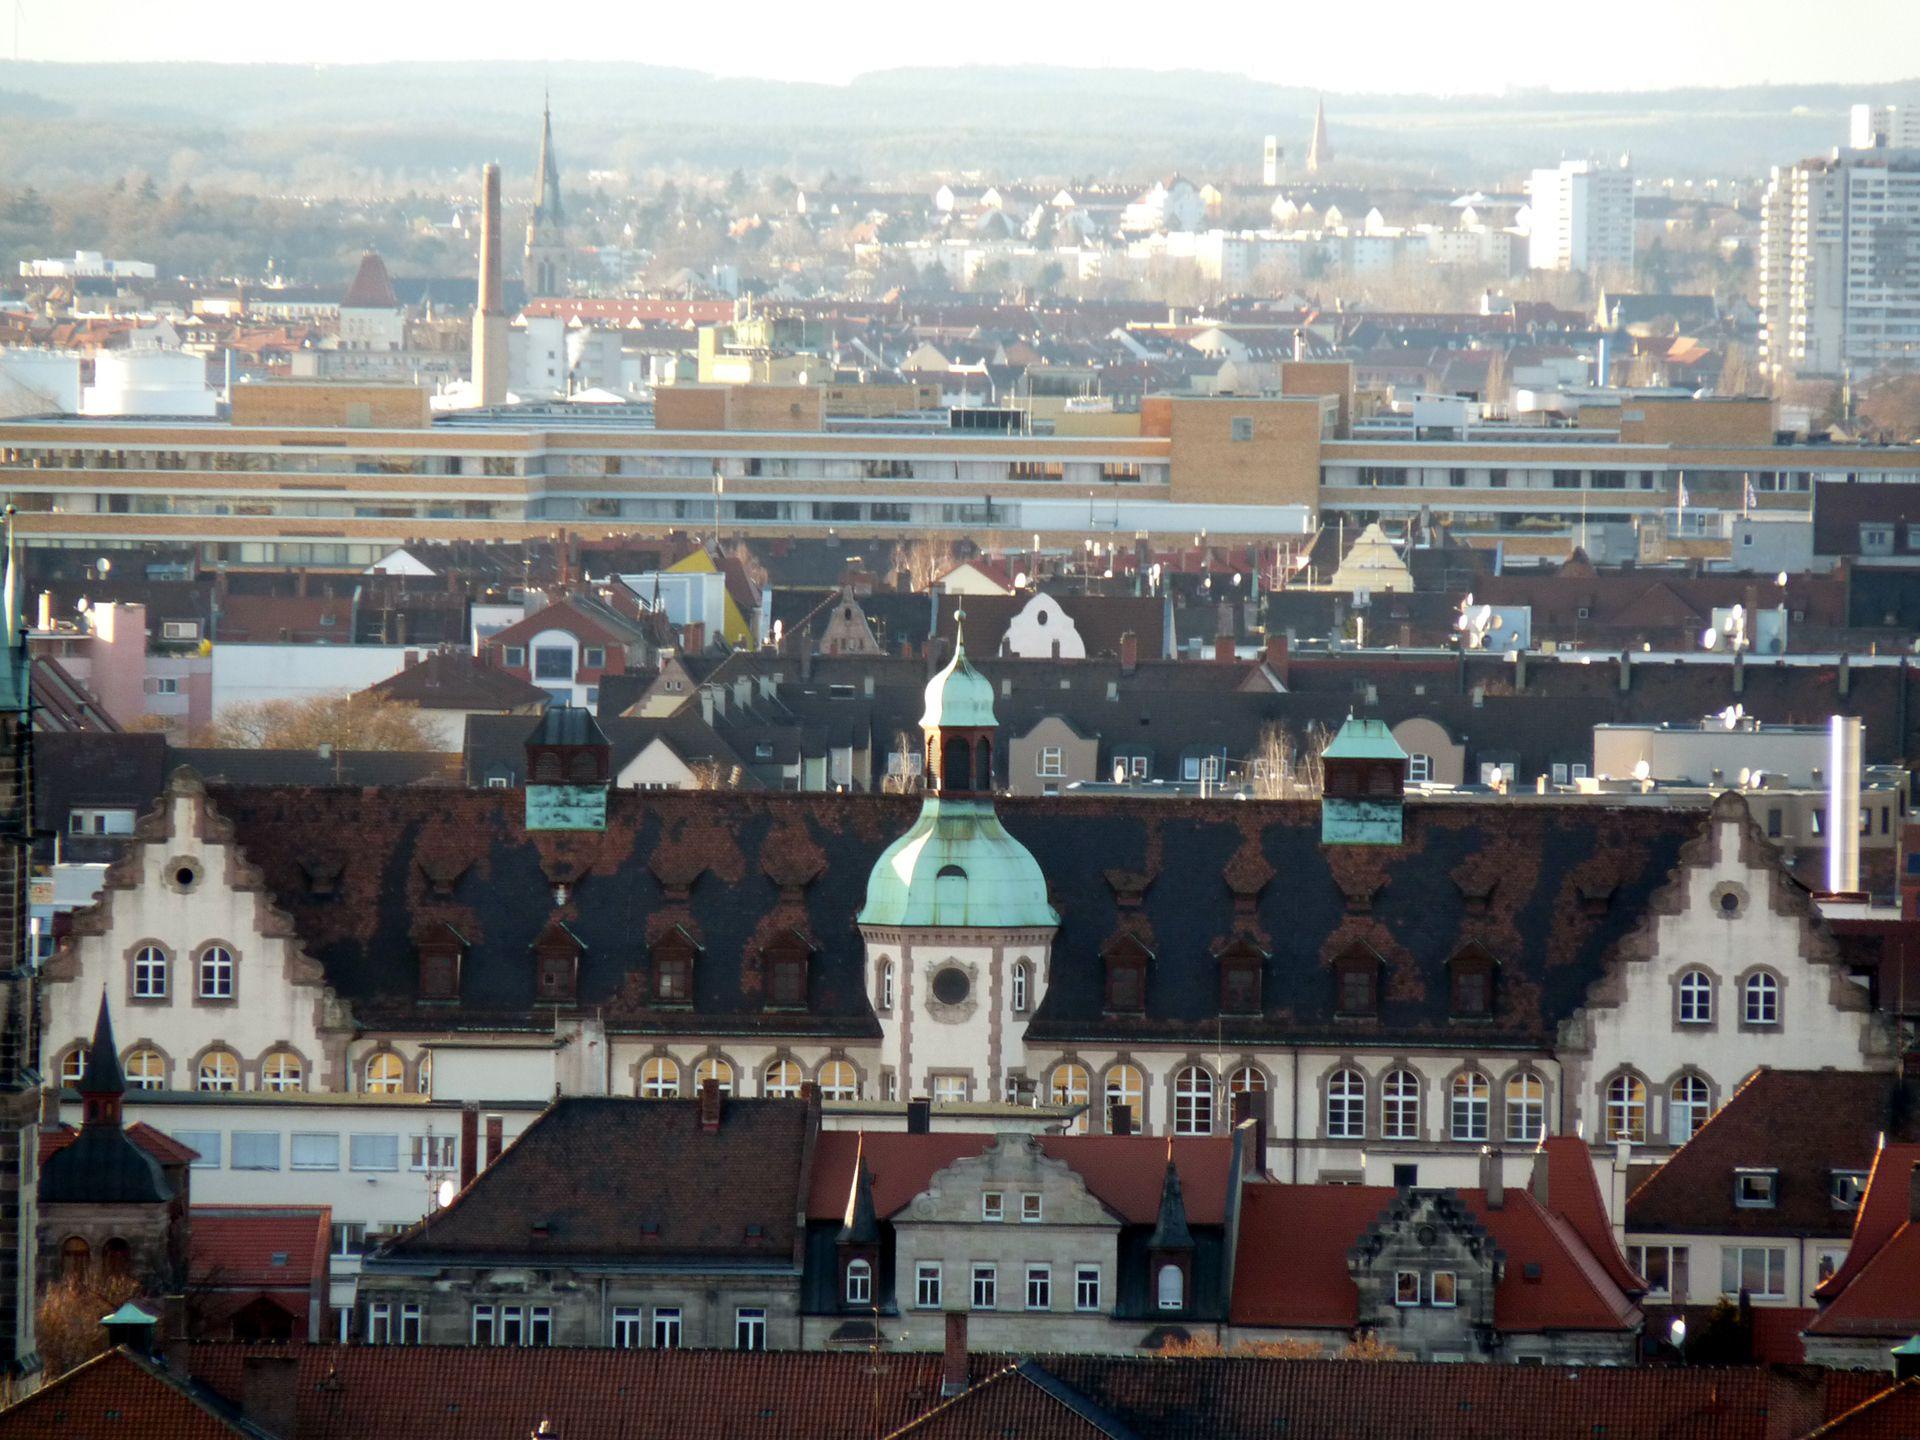 Johann-Daniel-Preißler-School View over Gostenhof with upper storey and roof of the Johann-Daniel-Preißler-School